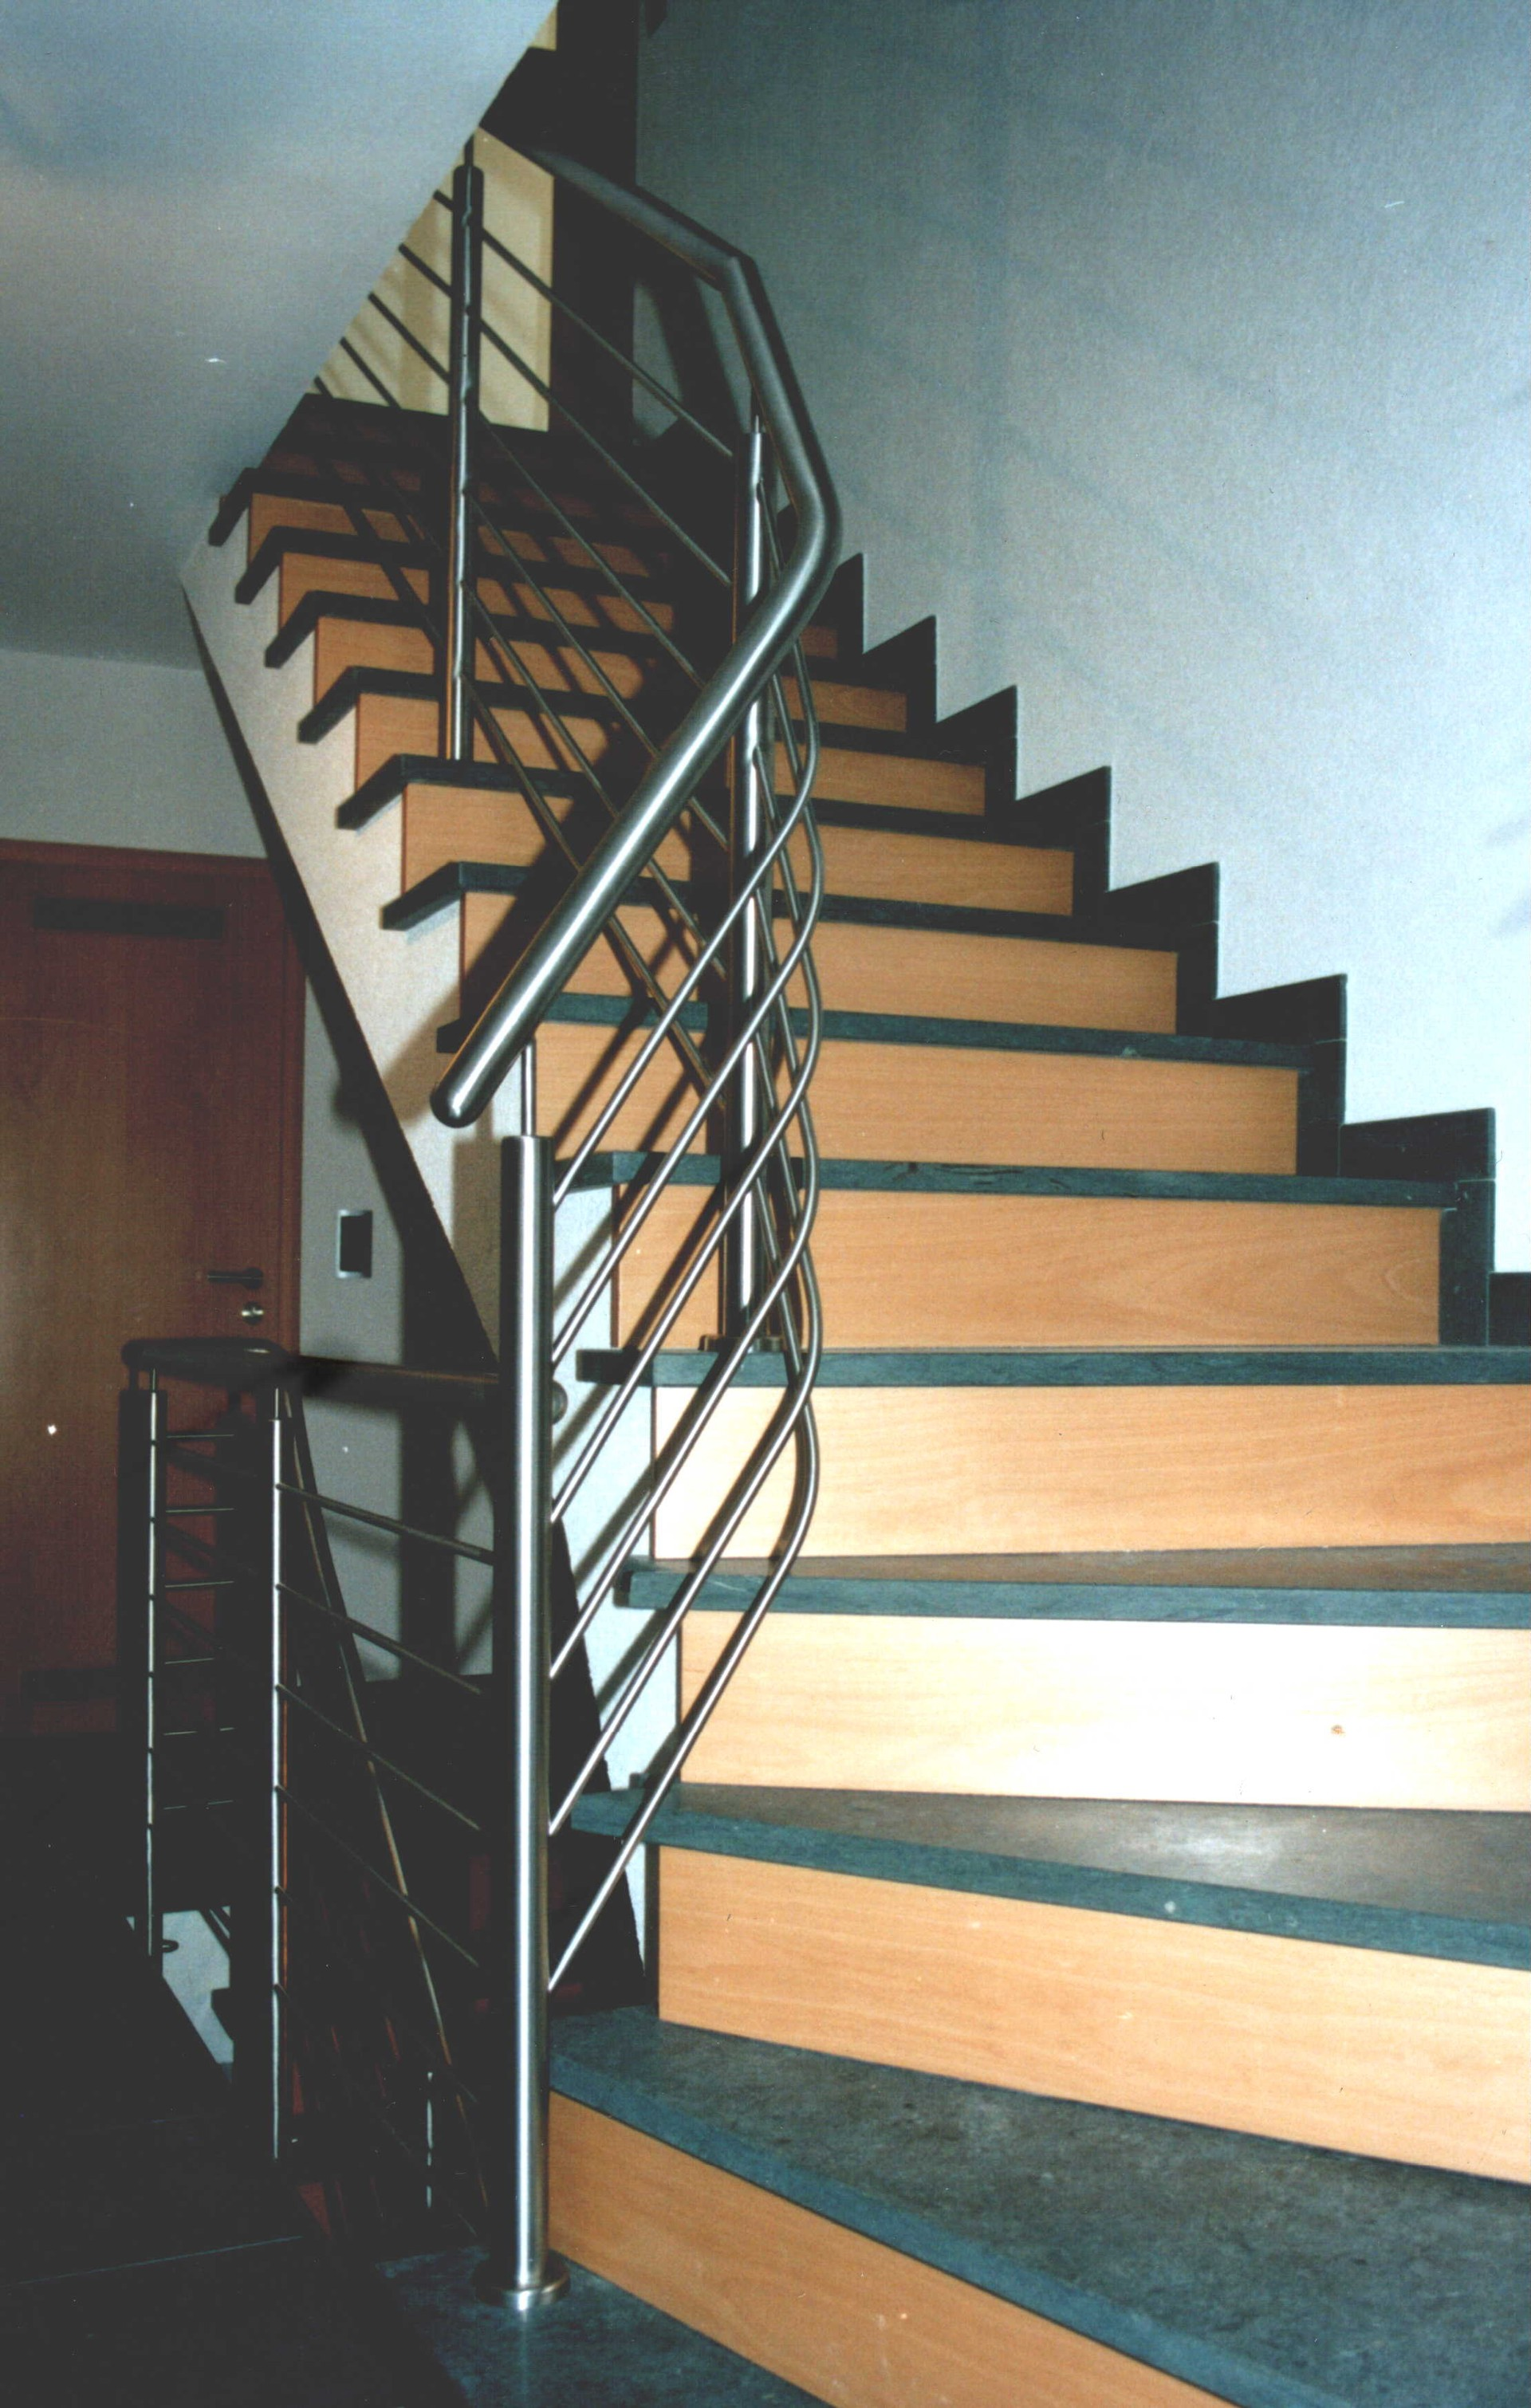 treppen gel nder metatec gmbh treppen gel nder balkongel nder terrassengel nder. Black Bedroom Furniture Sets. Home Design Ideas